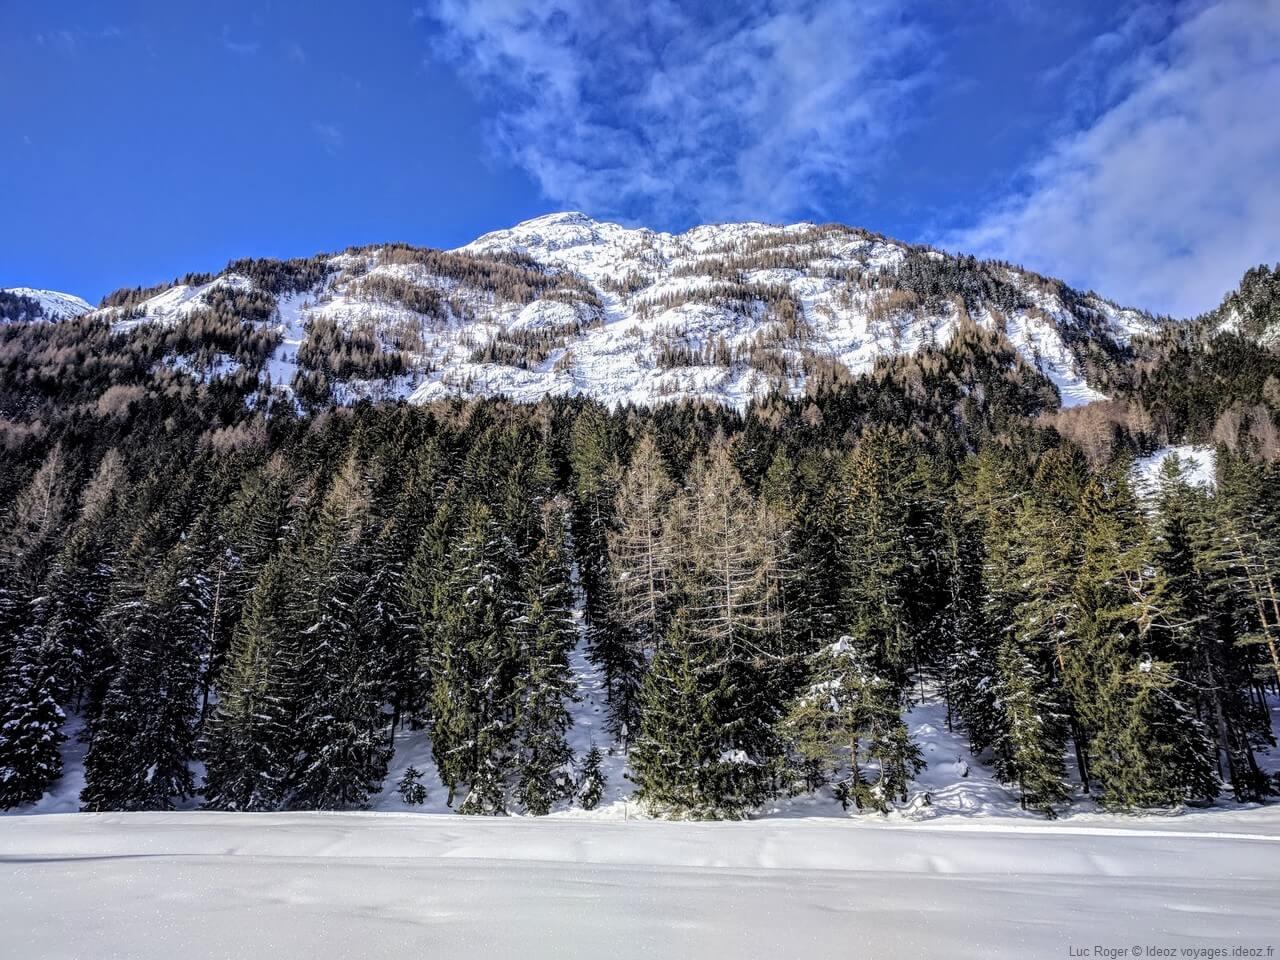 Mittenwald Riedboden montagnes et forets en hiver